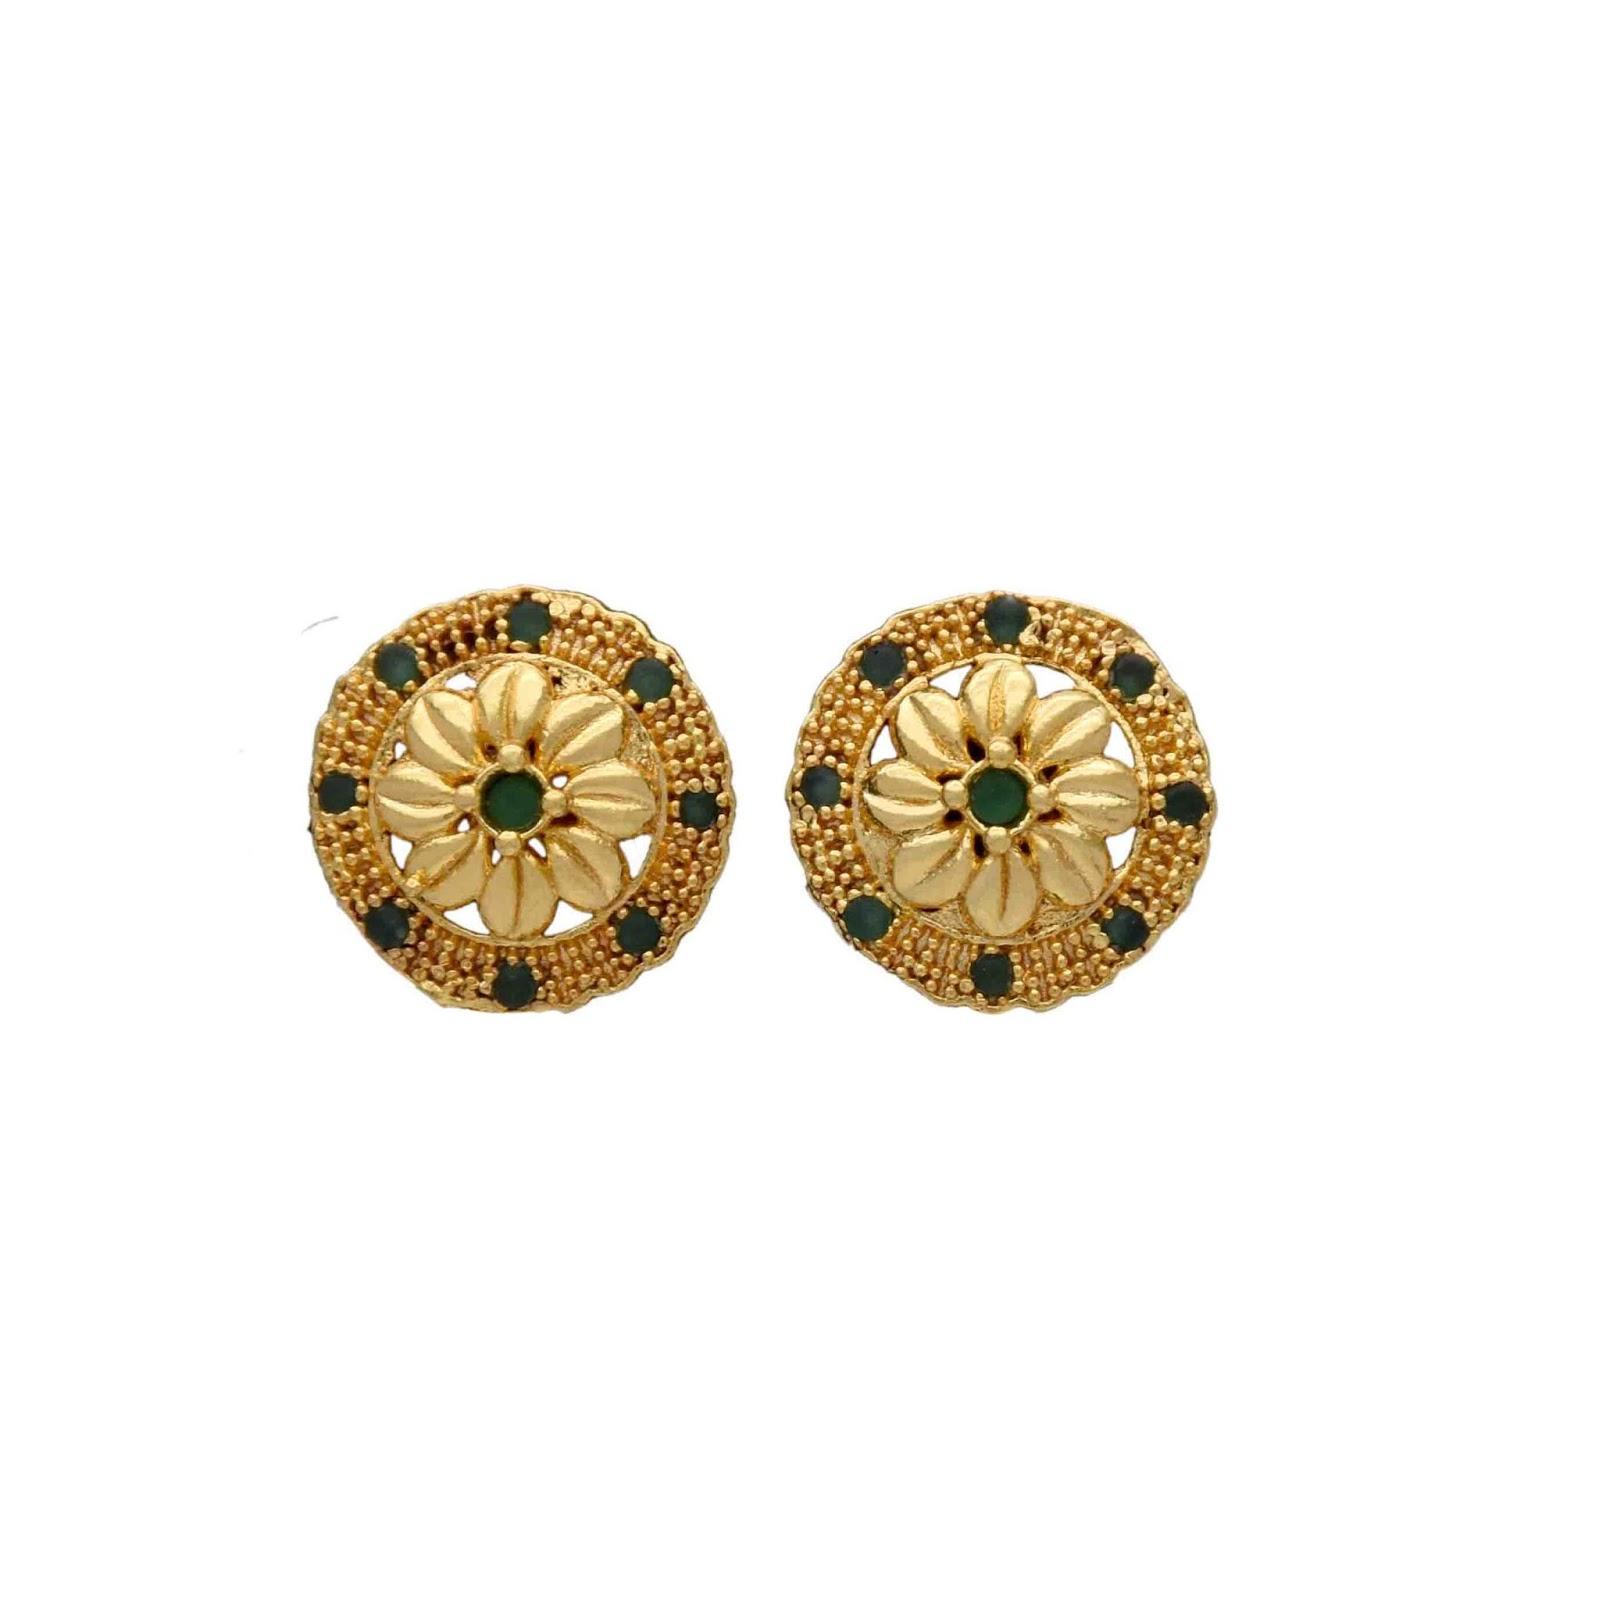 e3012ed7edee1 Kollam Supreme Premium Fashion Jewellery: Buy Gorgeous Gold Plated ...